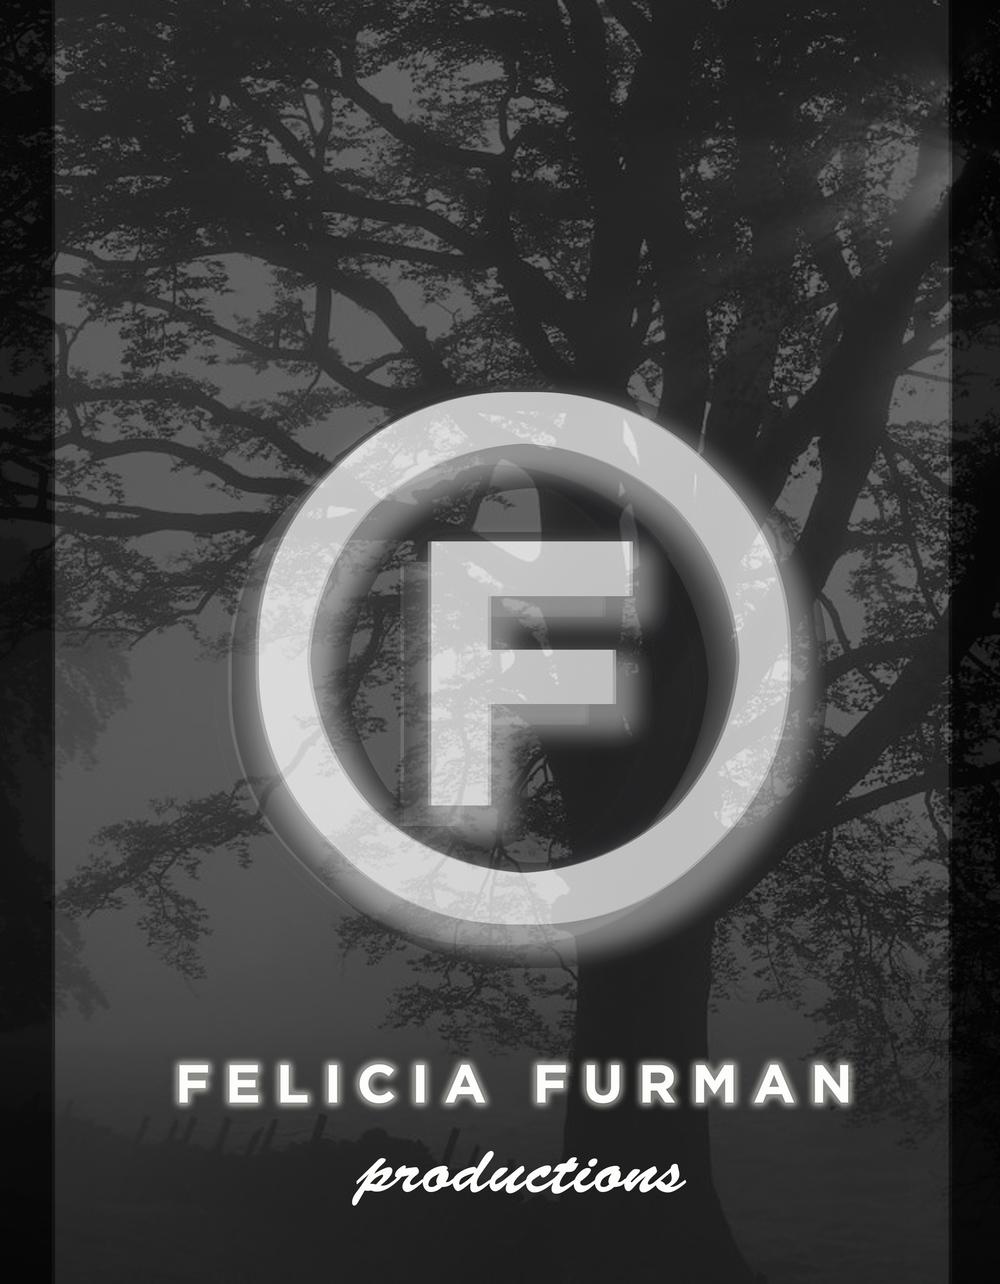 Logo/Mark based on old black & white movie titling